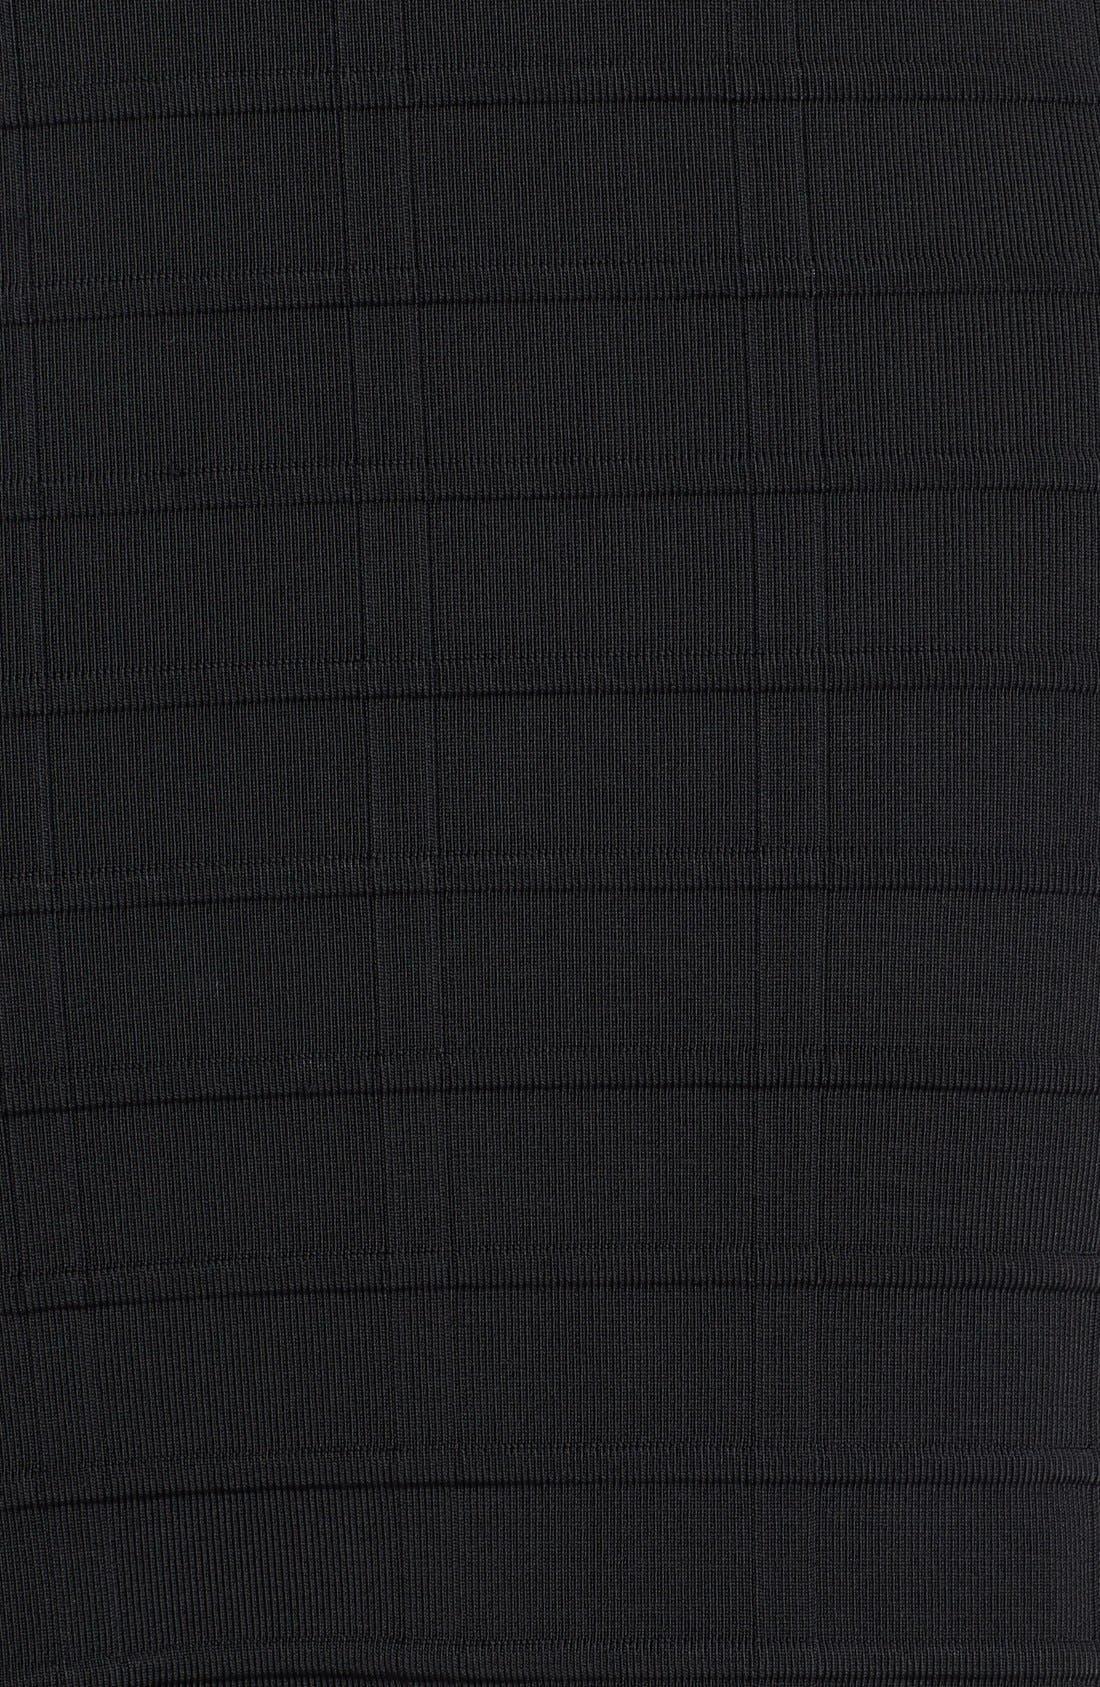 Alternate Image 3  - Vince Camuto Shadow Stripe Grid Stitch Sweater Dress